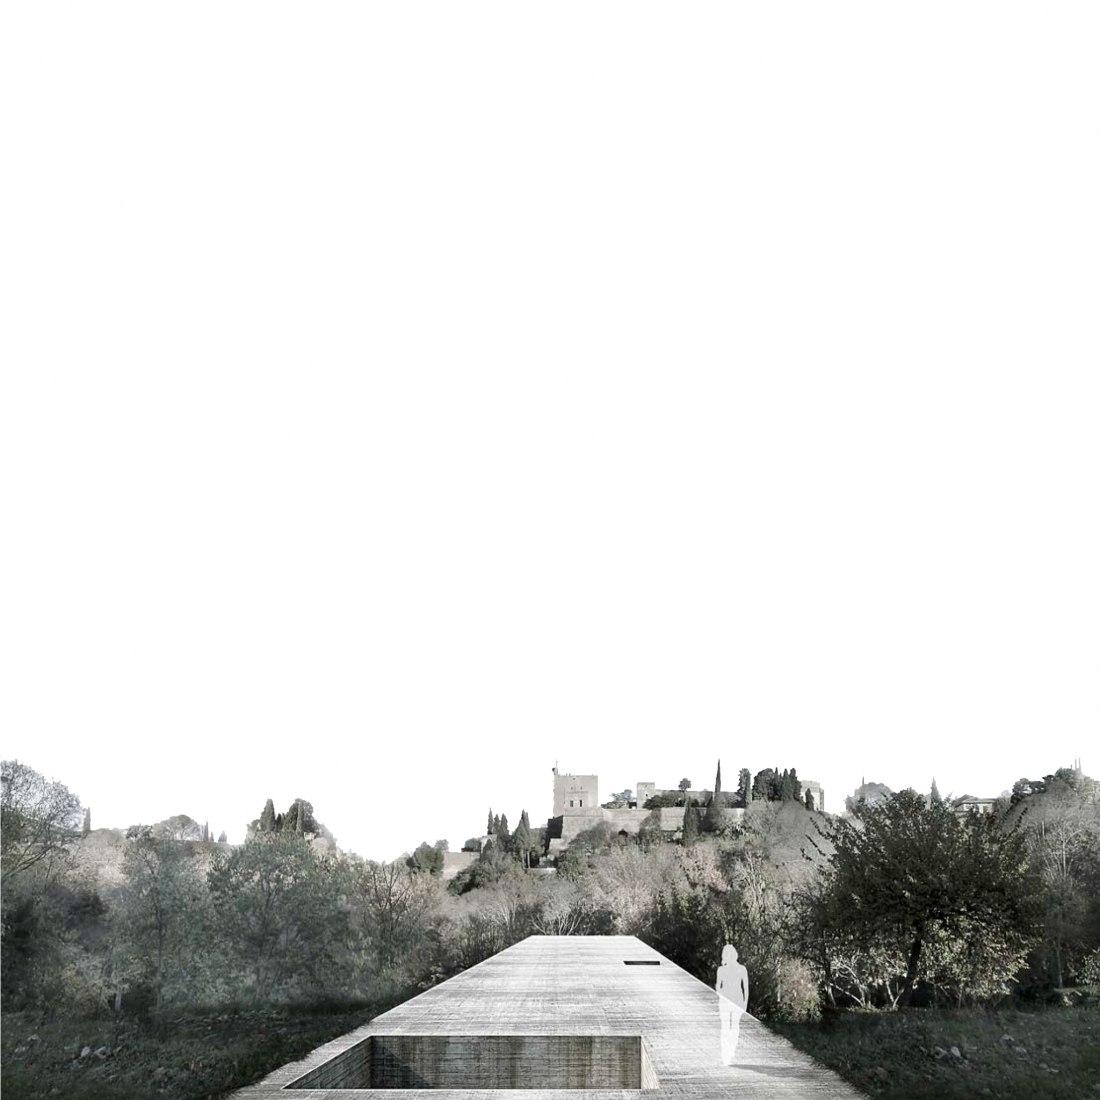 Visualización.1º Premio 2015. La promenade Alhambra por Agustín Gor Gómez